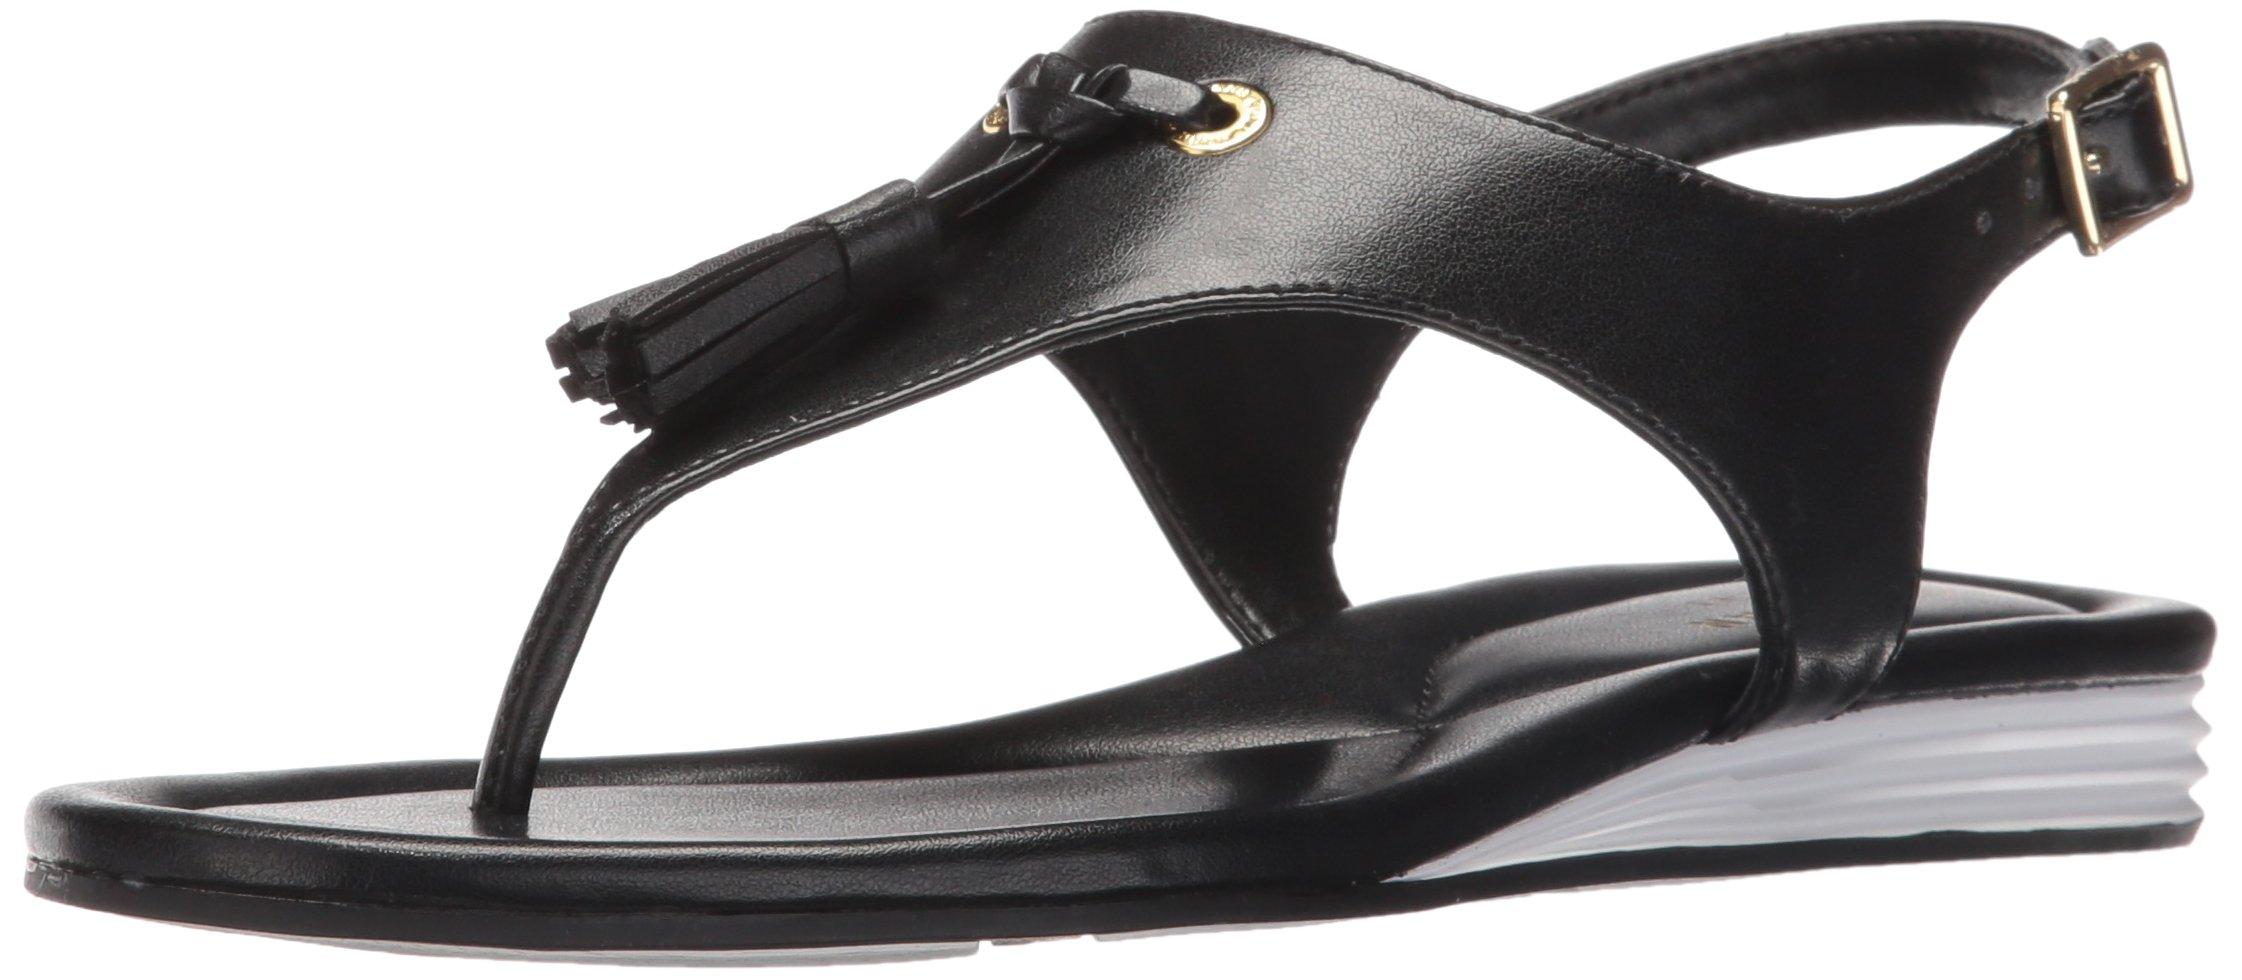 Cole Haan Women's Rona Grand Flat Sandal, Black, 6.5 B US